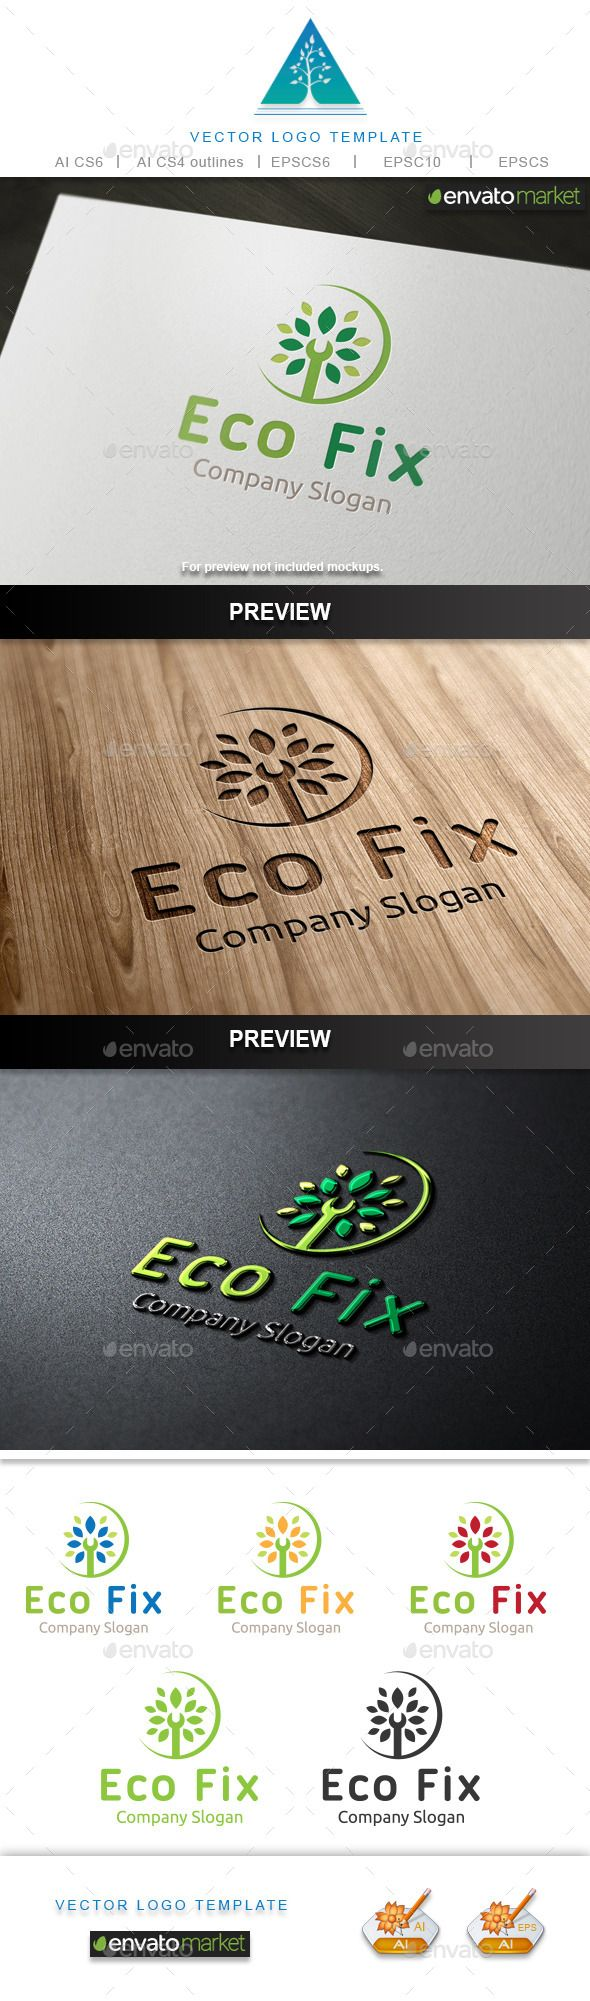 Eco Fix Logo by Aestro Eco Fix Logo design for creative studio company. Featured:AI CS4 Document EPS 10 Document PDF Document CMYK100 % Vector (Re-sizabl